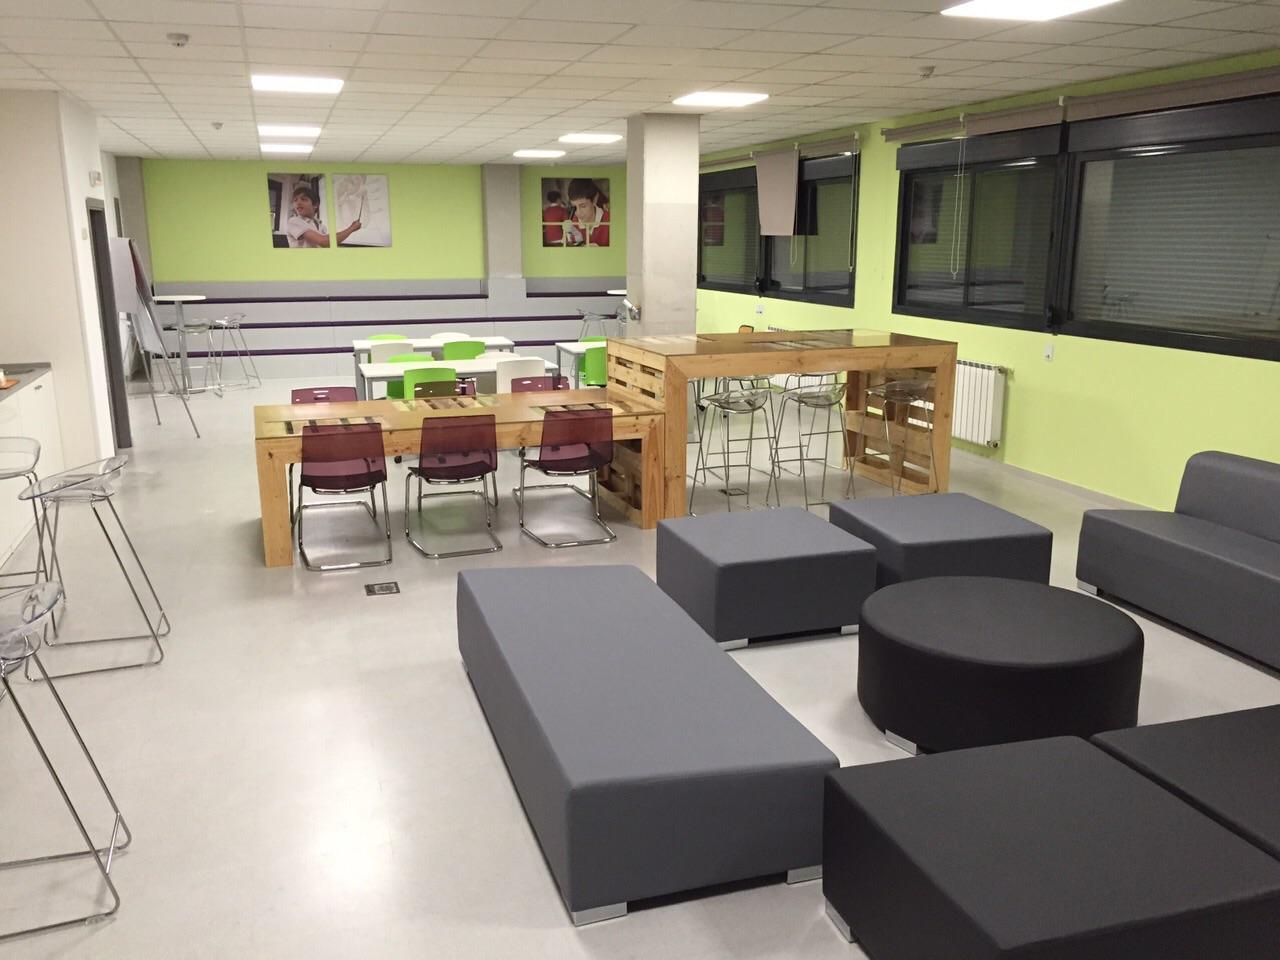 Sala comun de empleados Img-20141208-wa0000